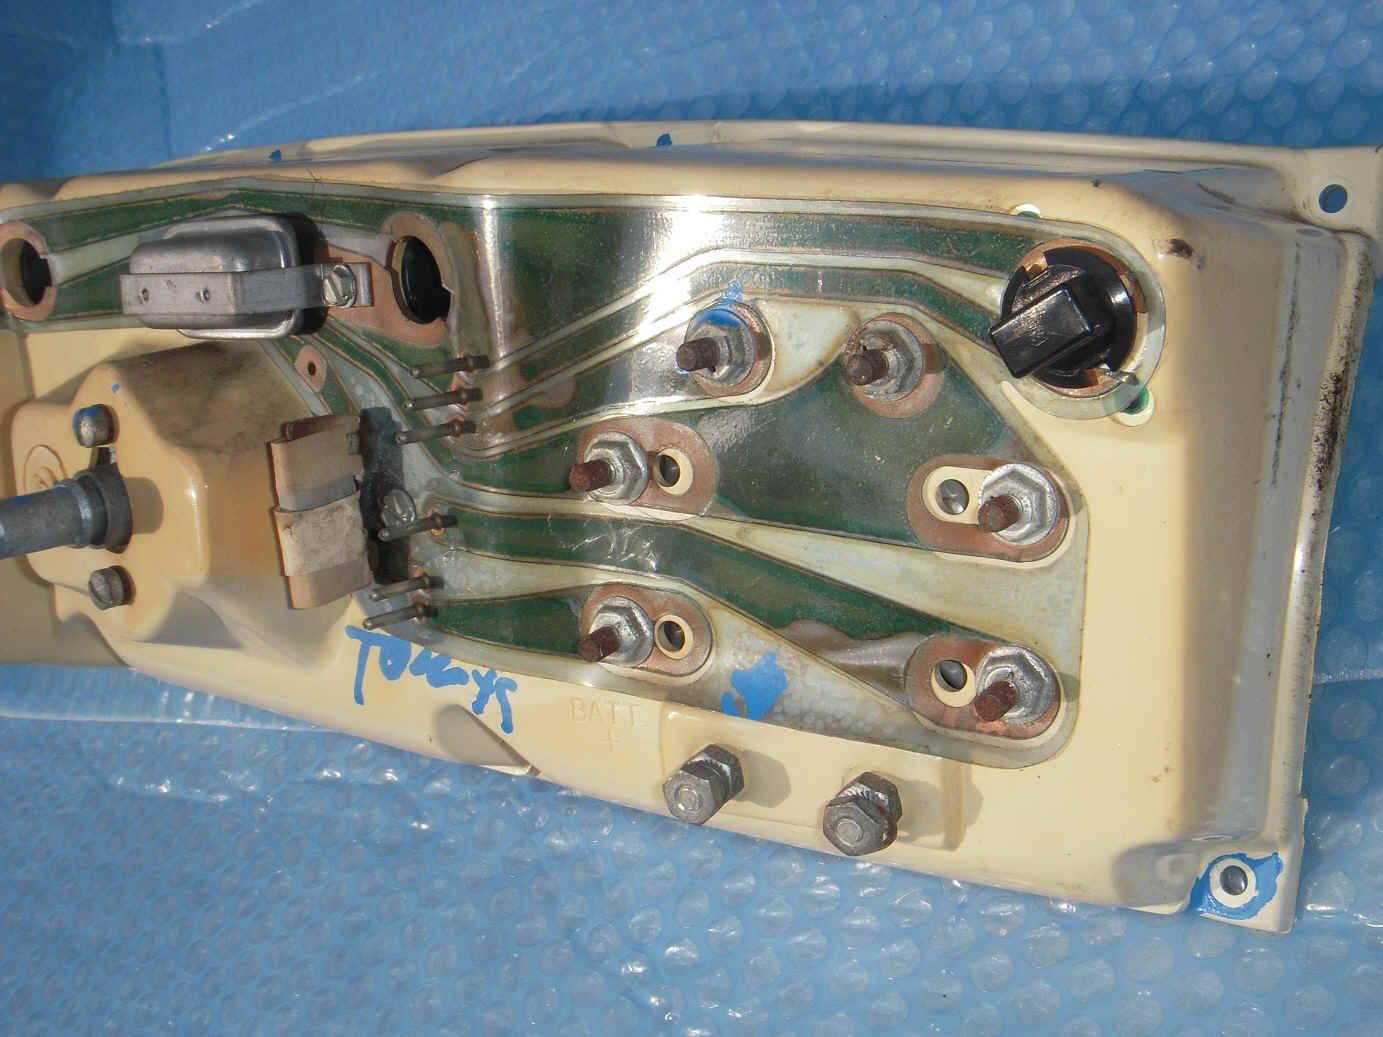 Amx Javelin 68 69 70 1969 Wiring Diagram 834875 Bytes Low Miler Gauges Rear